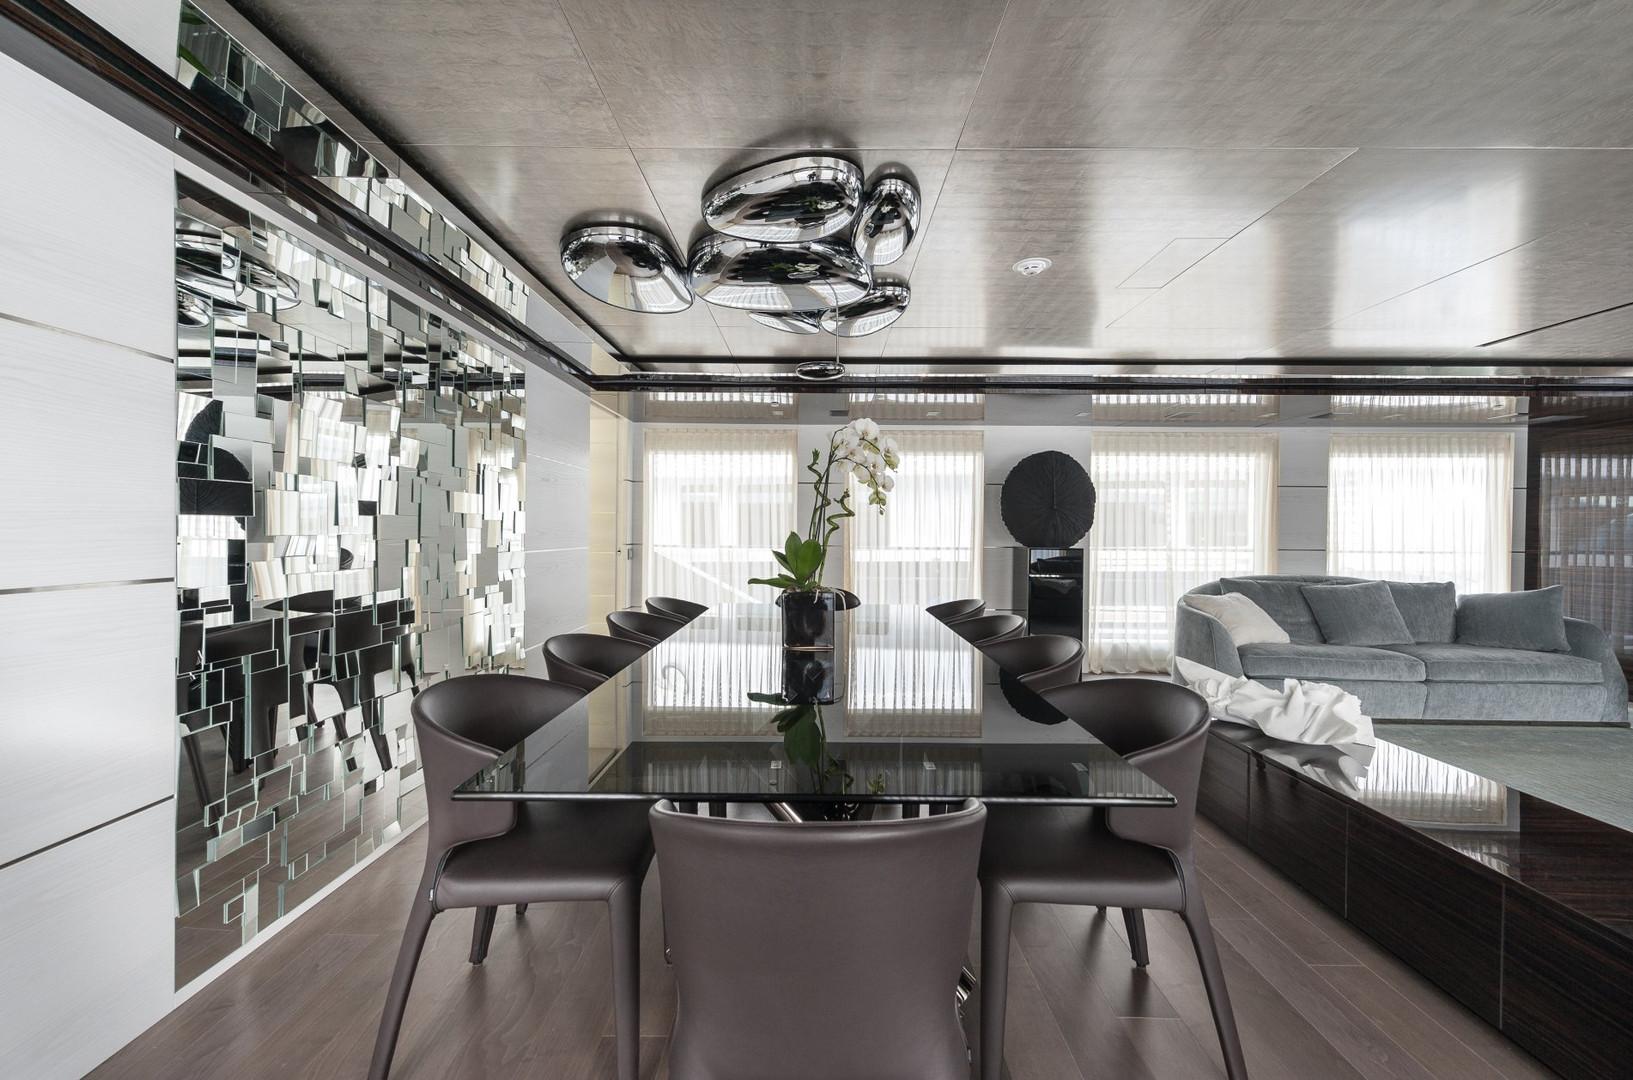 Yacht ENTOURAGE - formal interior dining